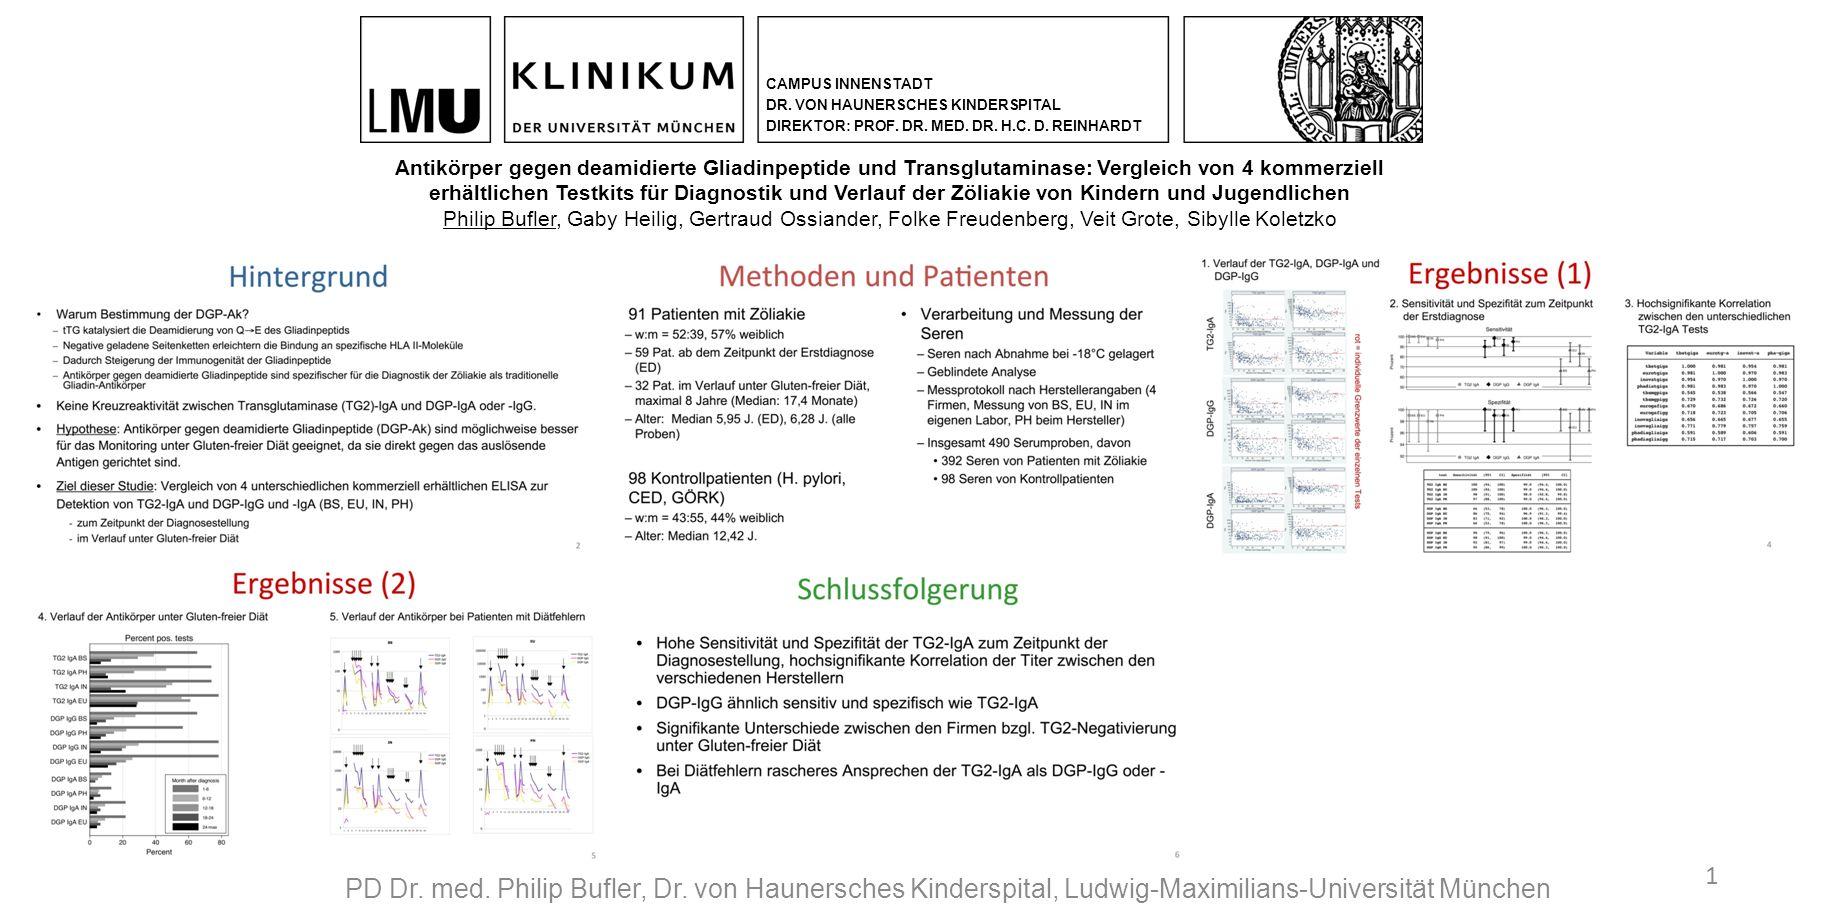 1 PD Dr. med. Philip Bufler, Dr. von Haunersches Kinderspital, Ludwig-Maximilians-Universität München CAMPUS INNENSTADT DR. VON HAUNERSCHES KINDERSPIT